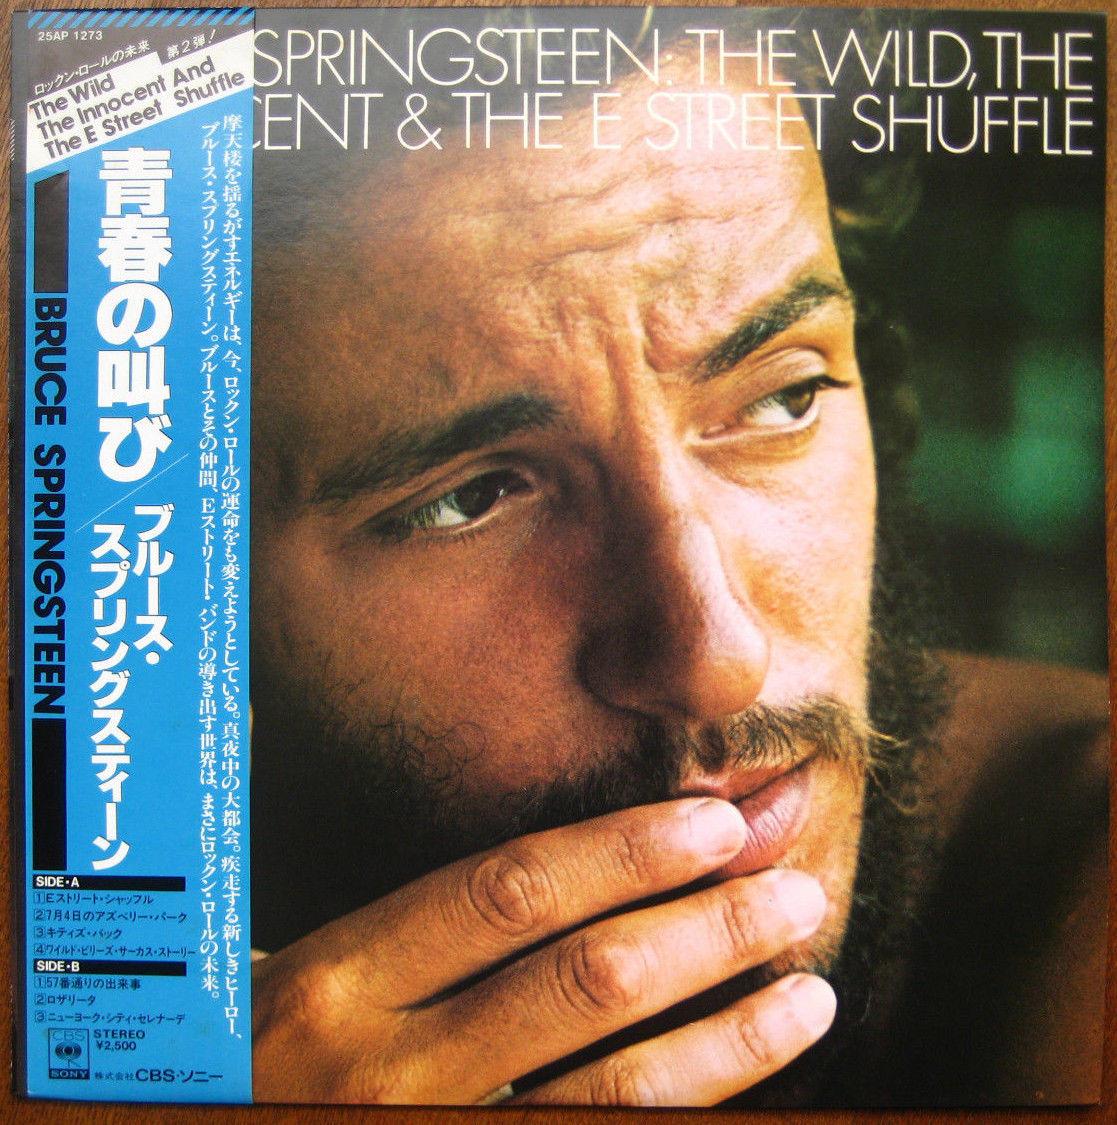 Bruce Springsteen The Wild, The Innocent & The E Street Shuffle Japan 25AP-1273